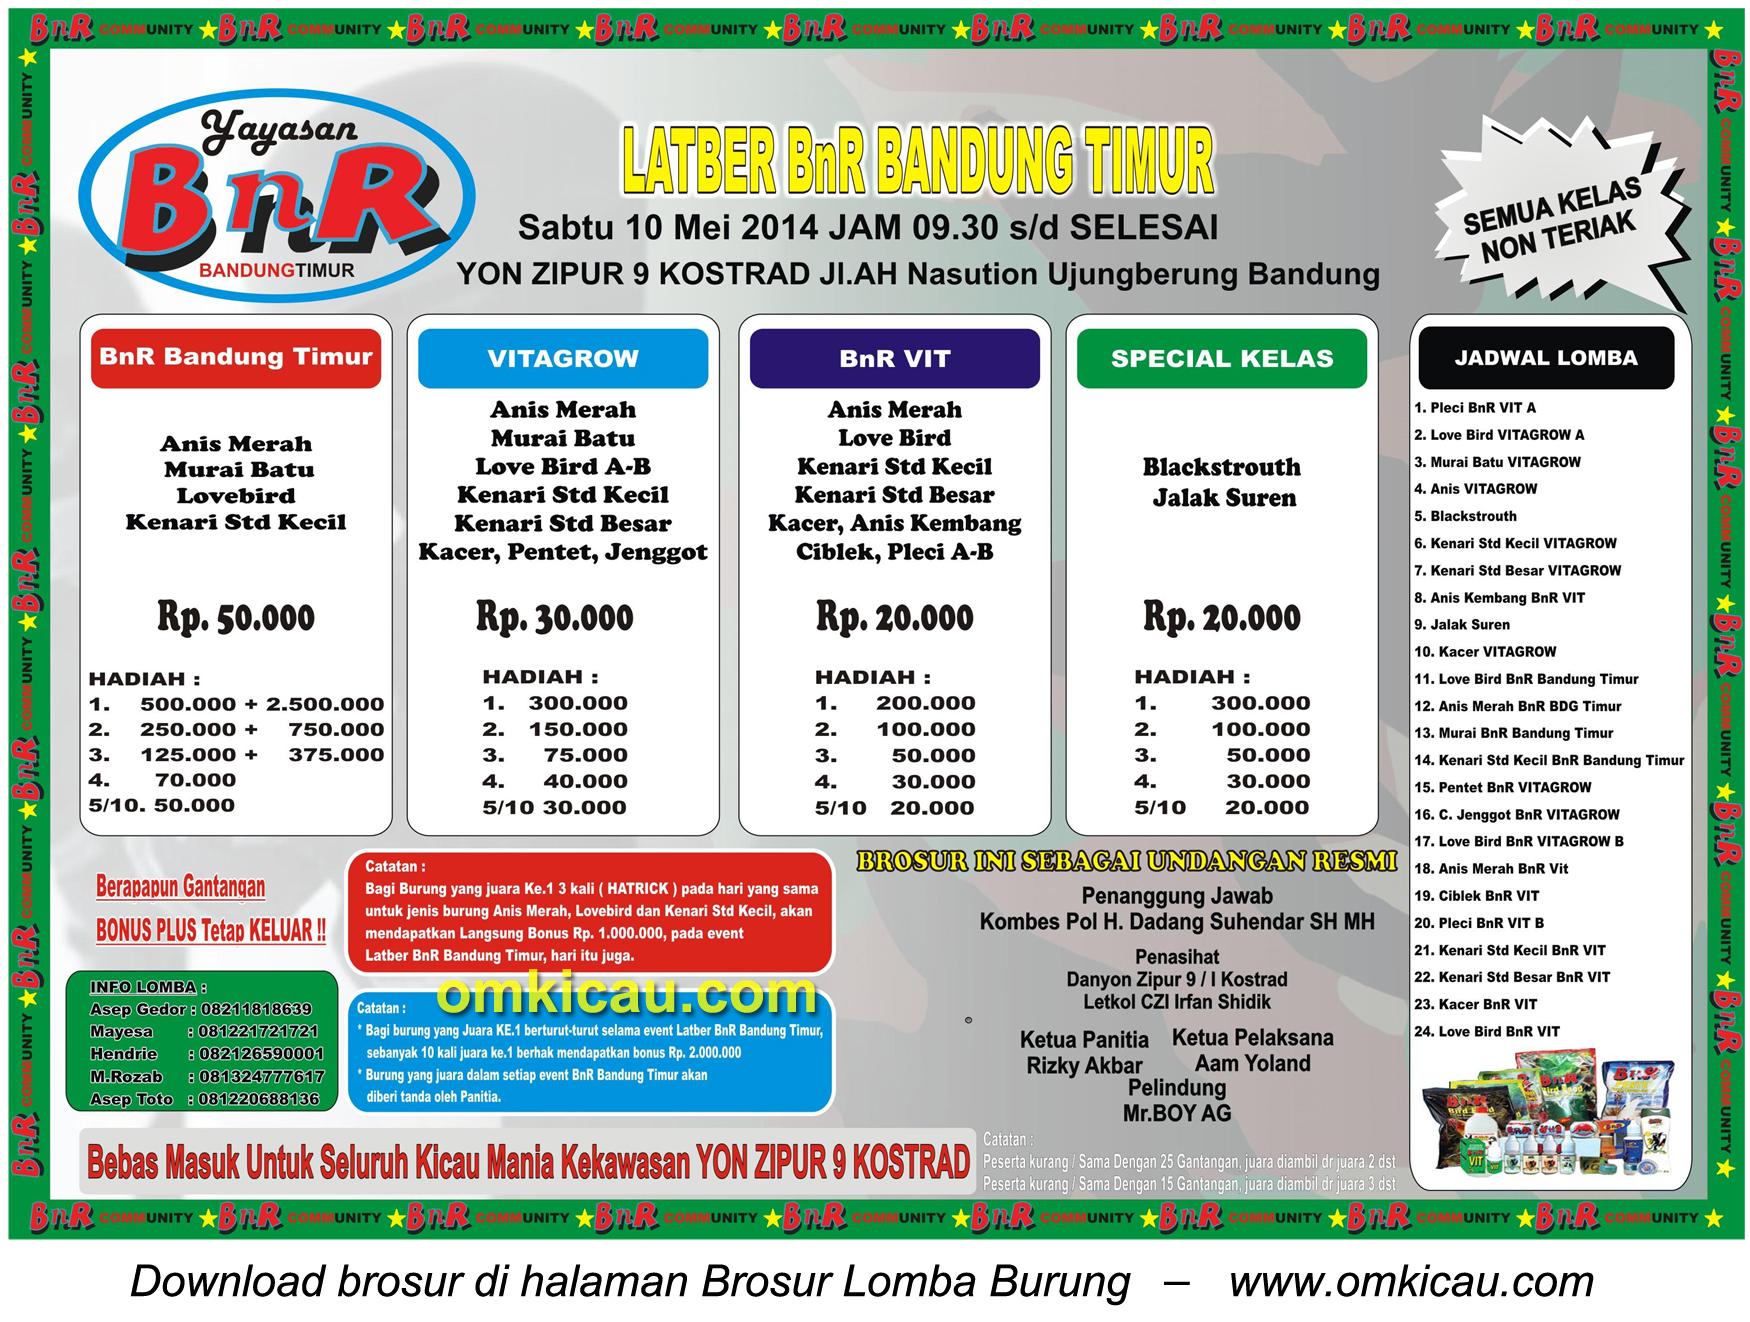 Brosur Latber BnR Bandung Timur, Bandung, 10 Mei 2014